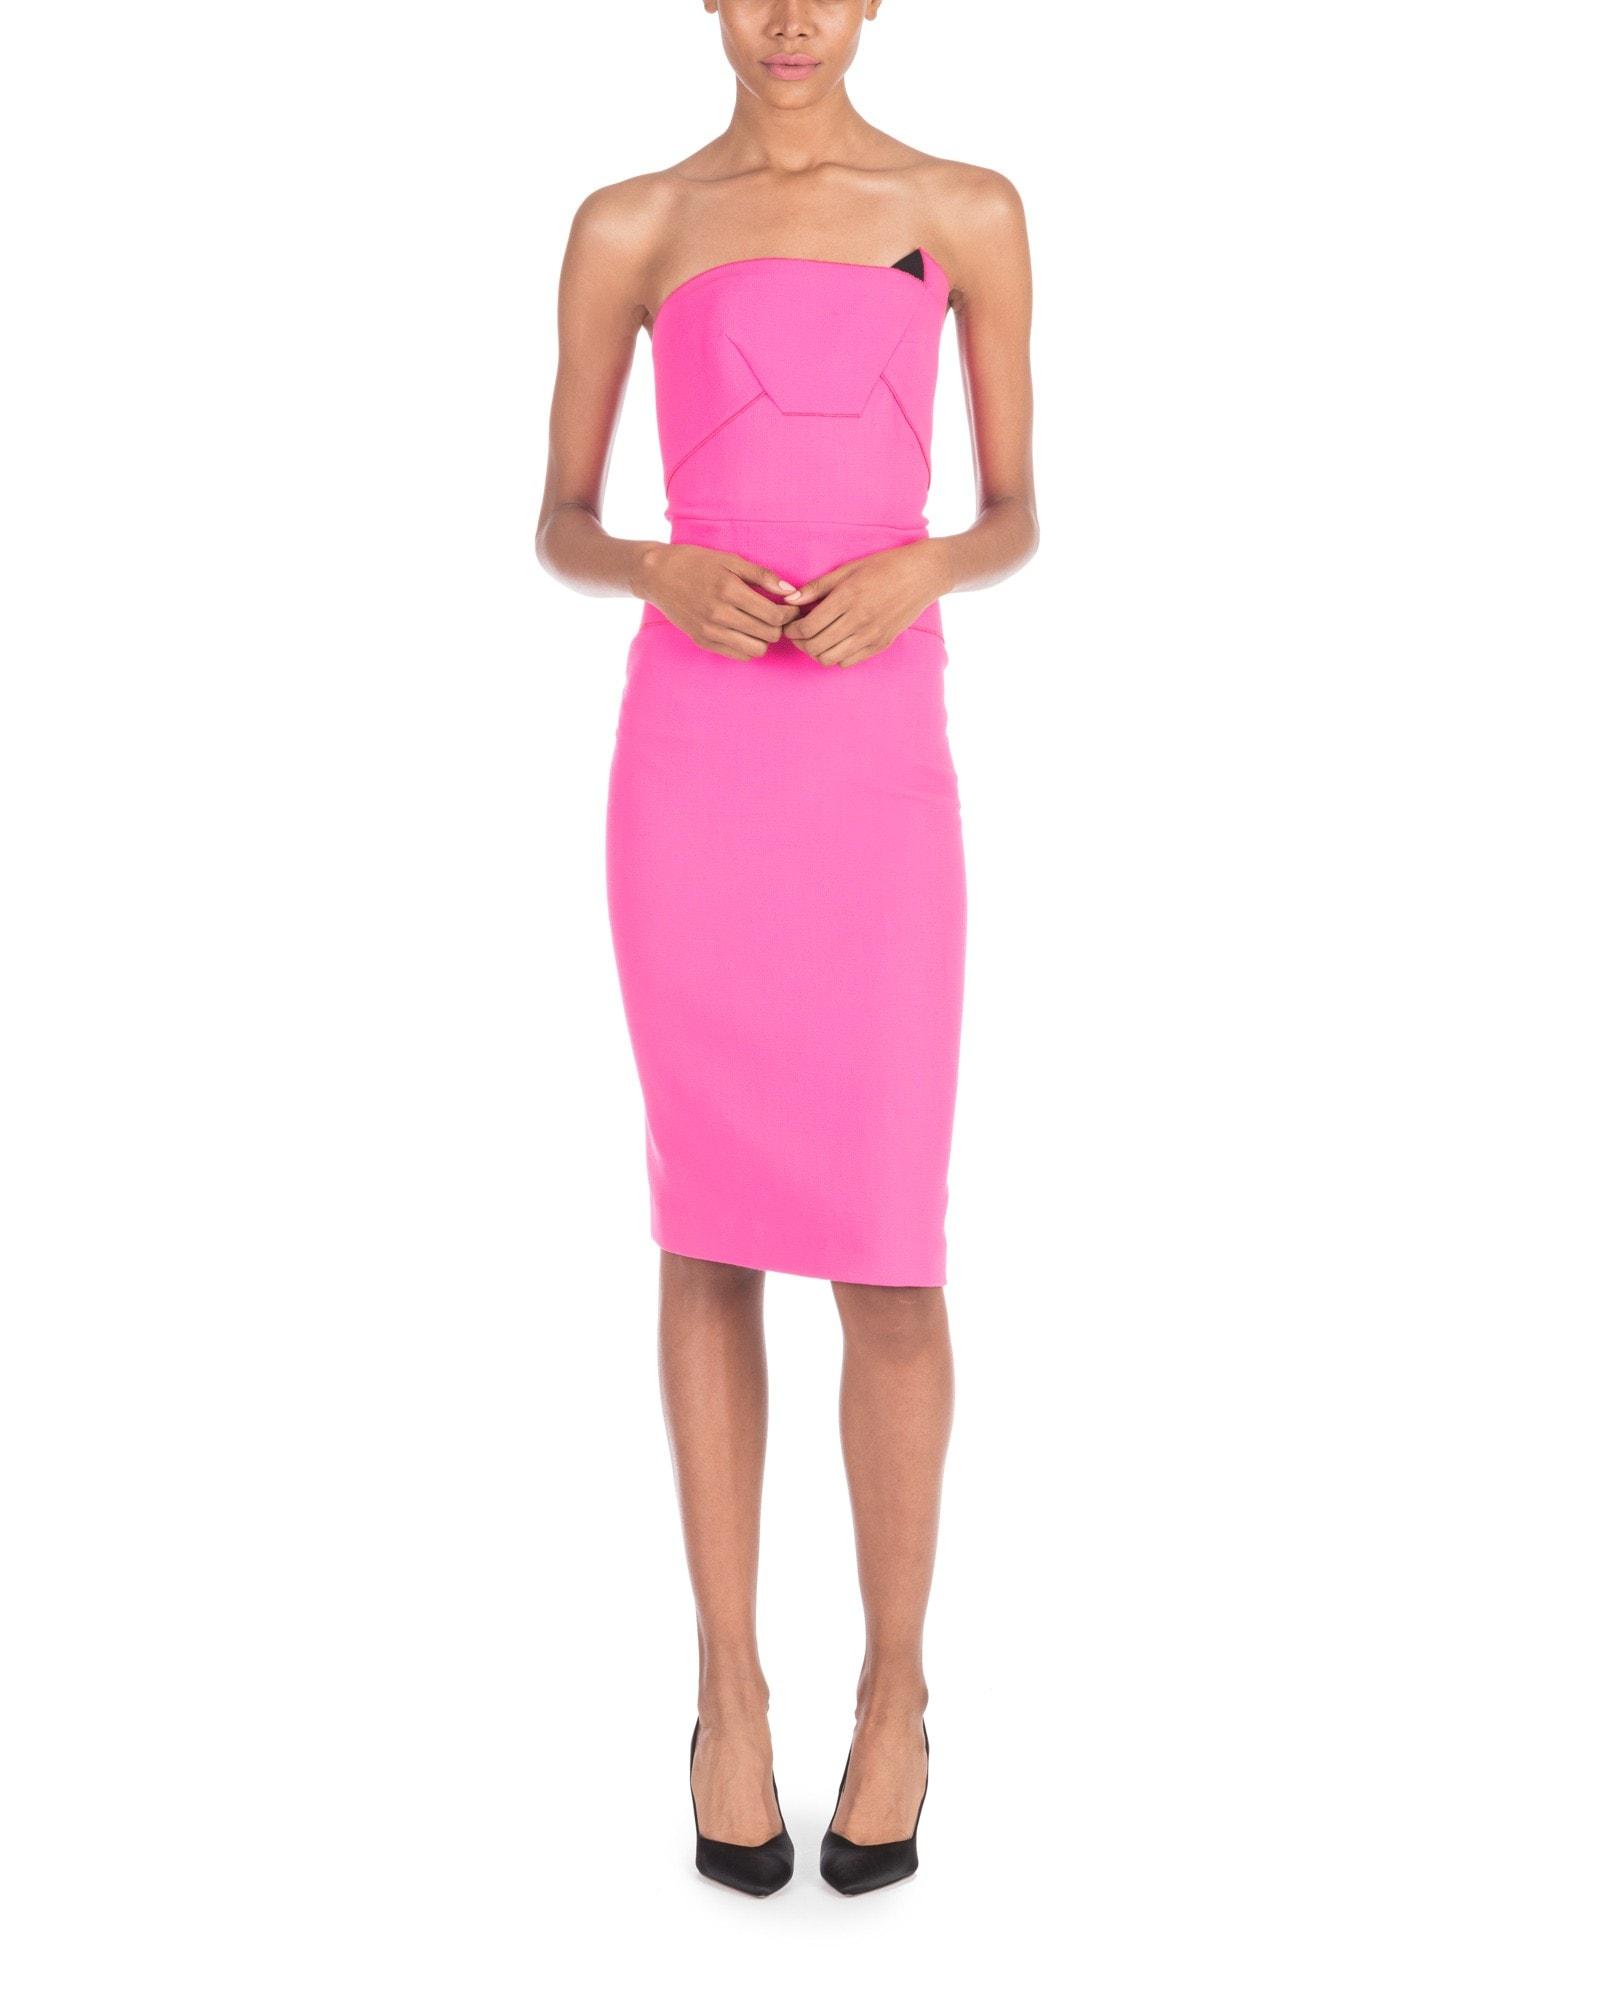 Strapless Fuchsia Pencil Dress